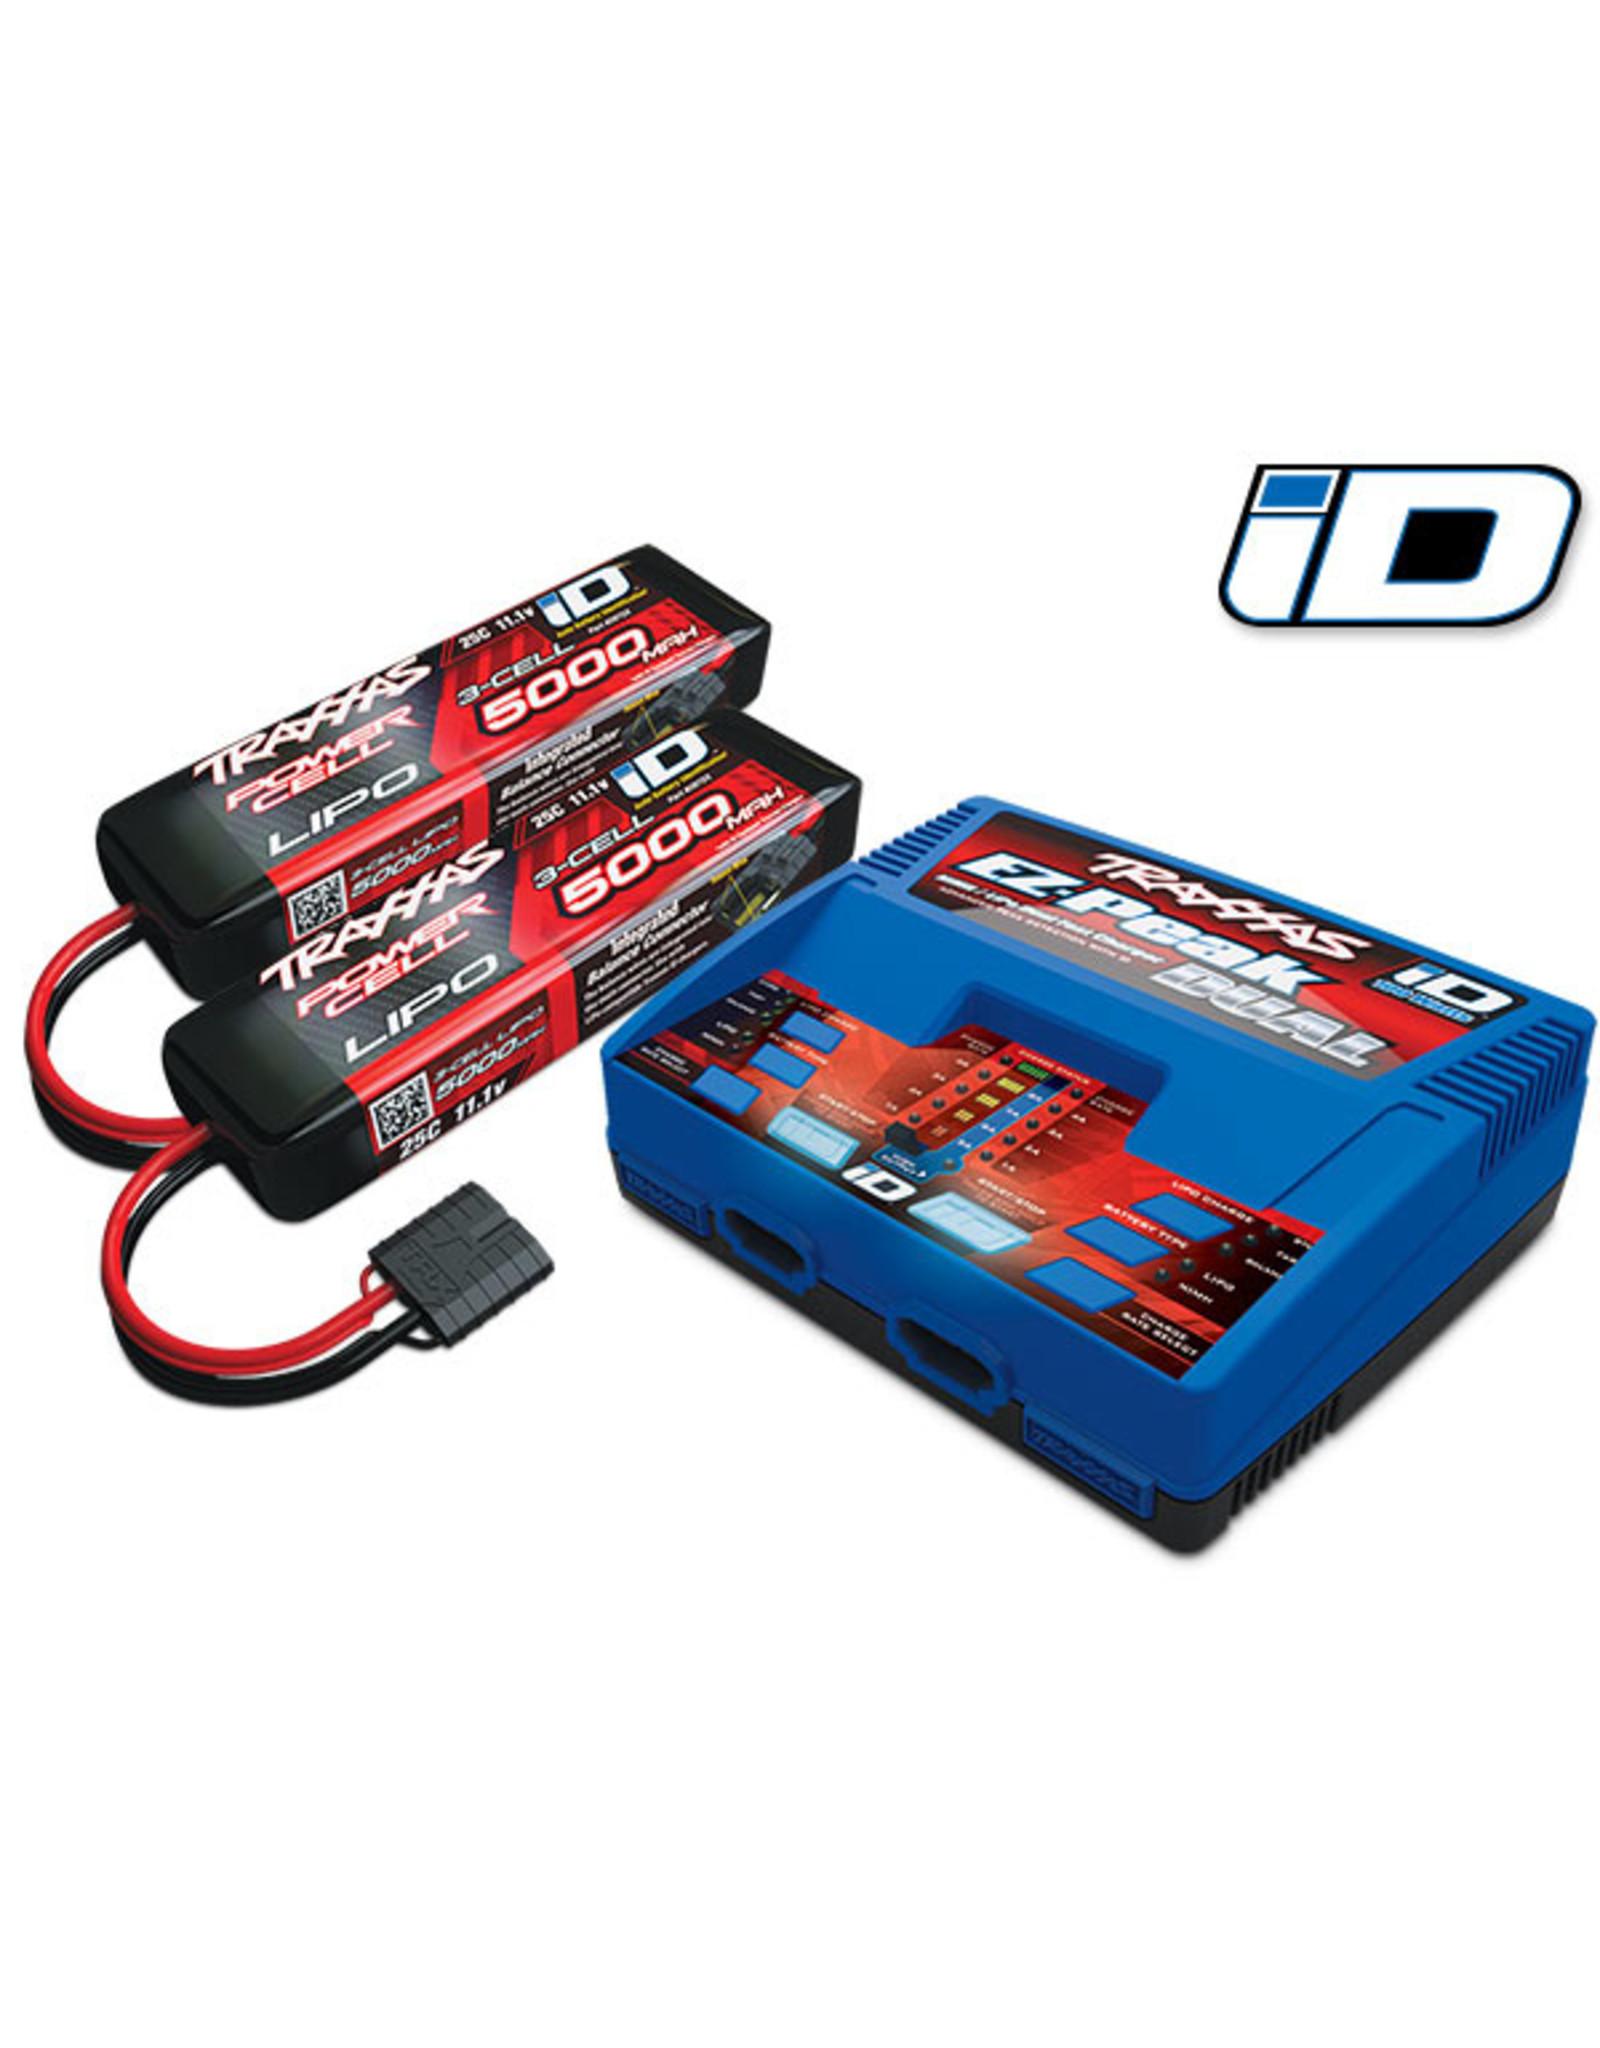 Traxxas 2990 - EZ-Peak Dual 3S Completer Pack - 2972 + 2872X(2)